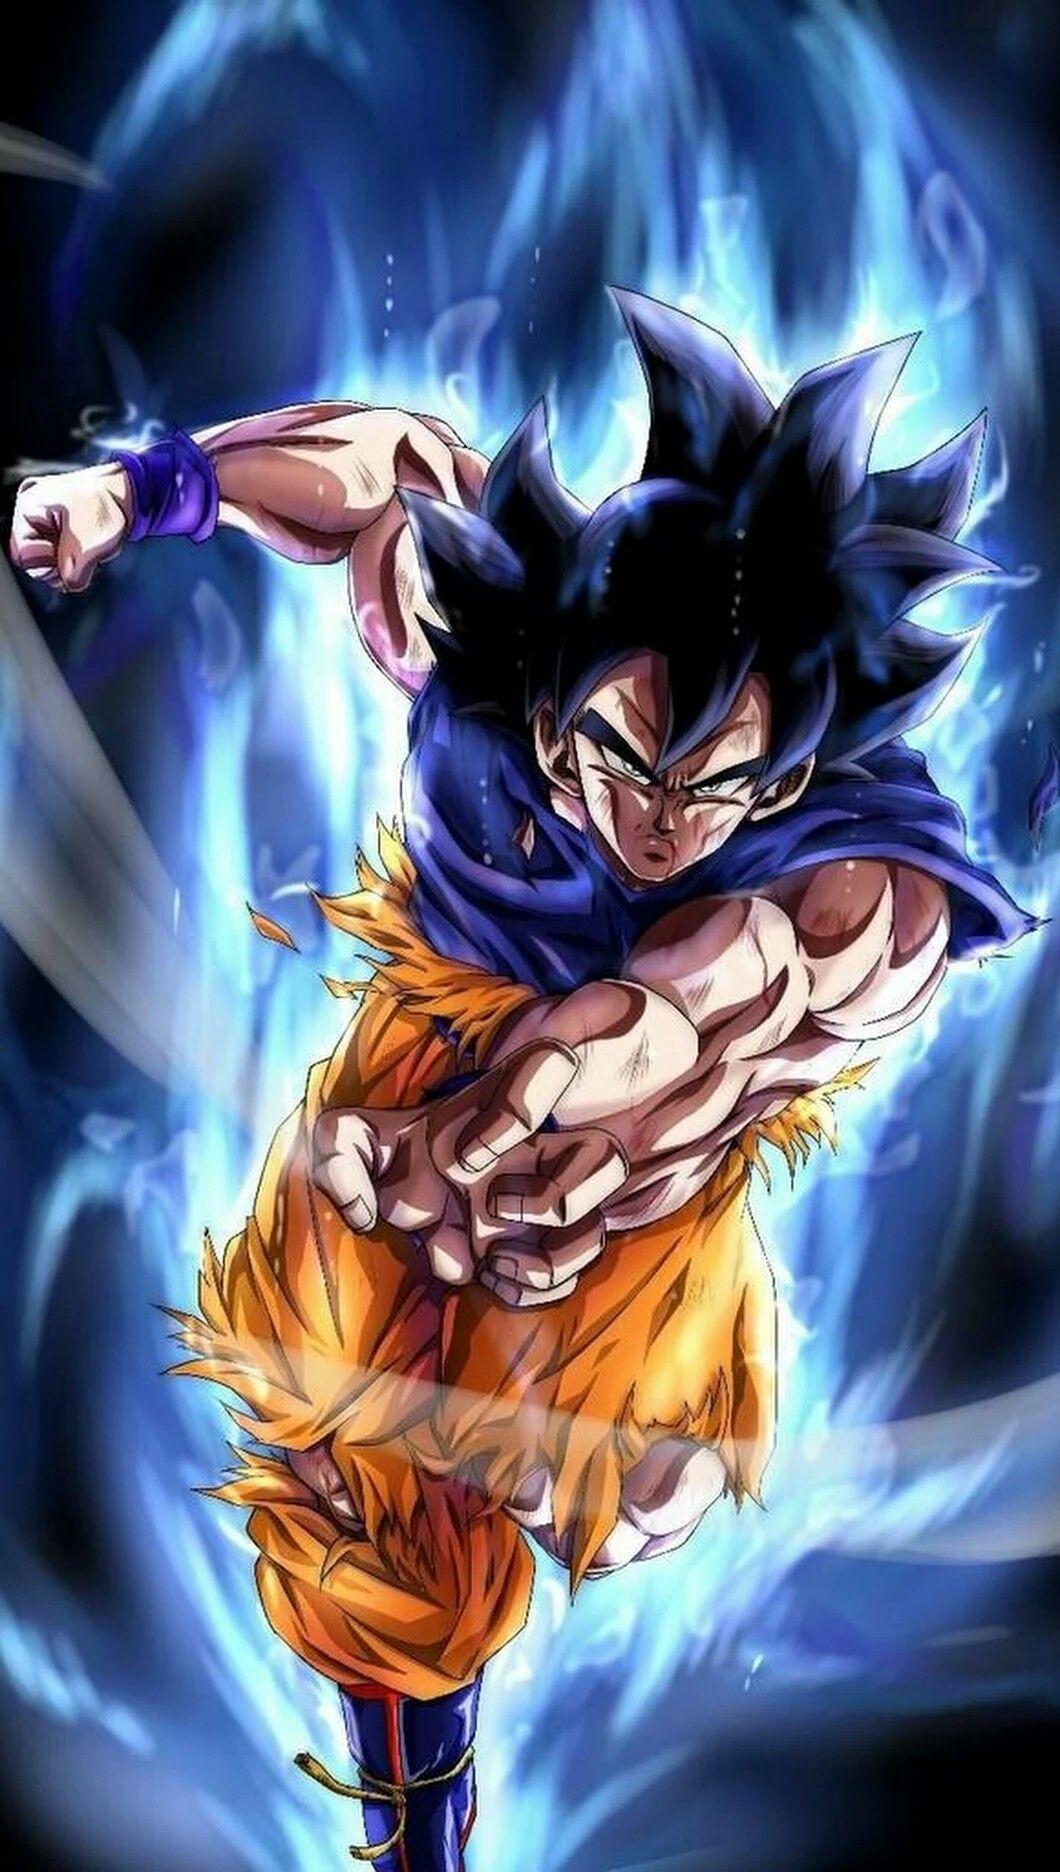 Pin by Divine Crimson♦️ on Dragon Ball/GT/Z/Super